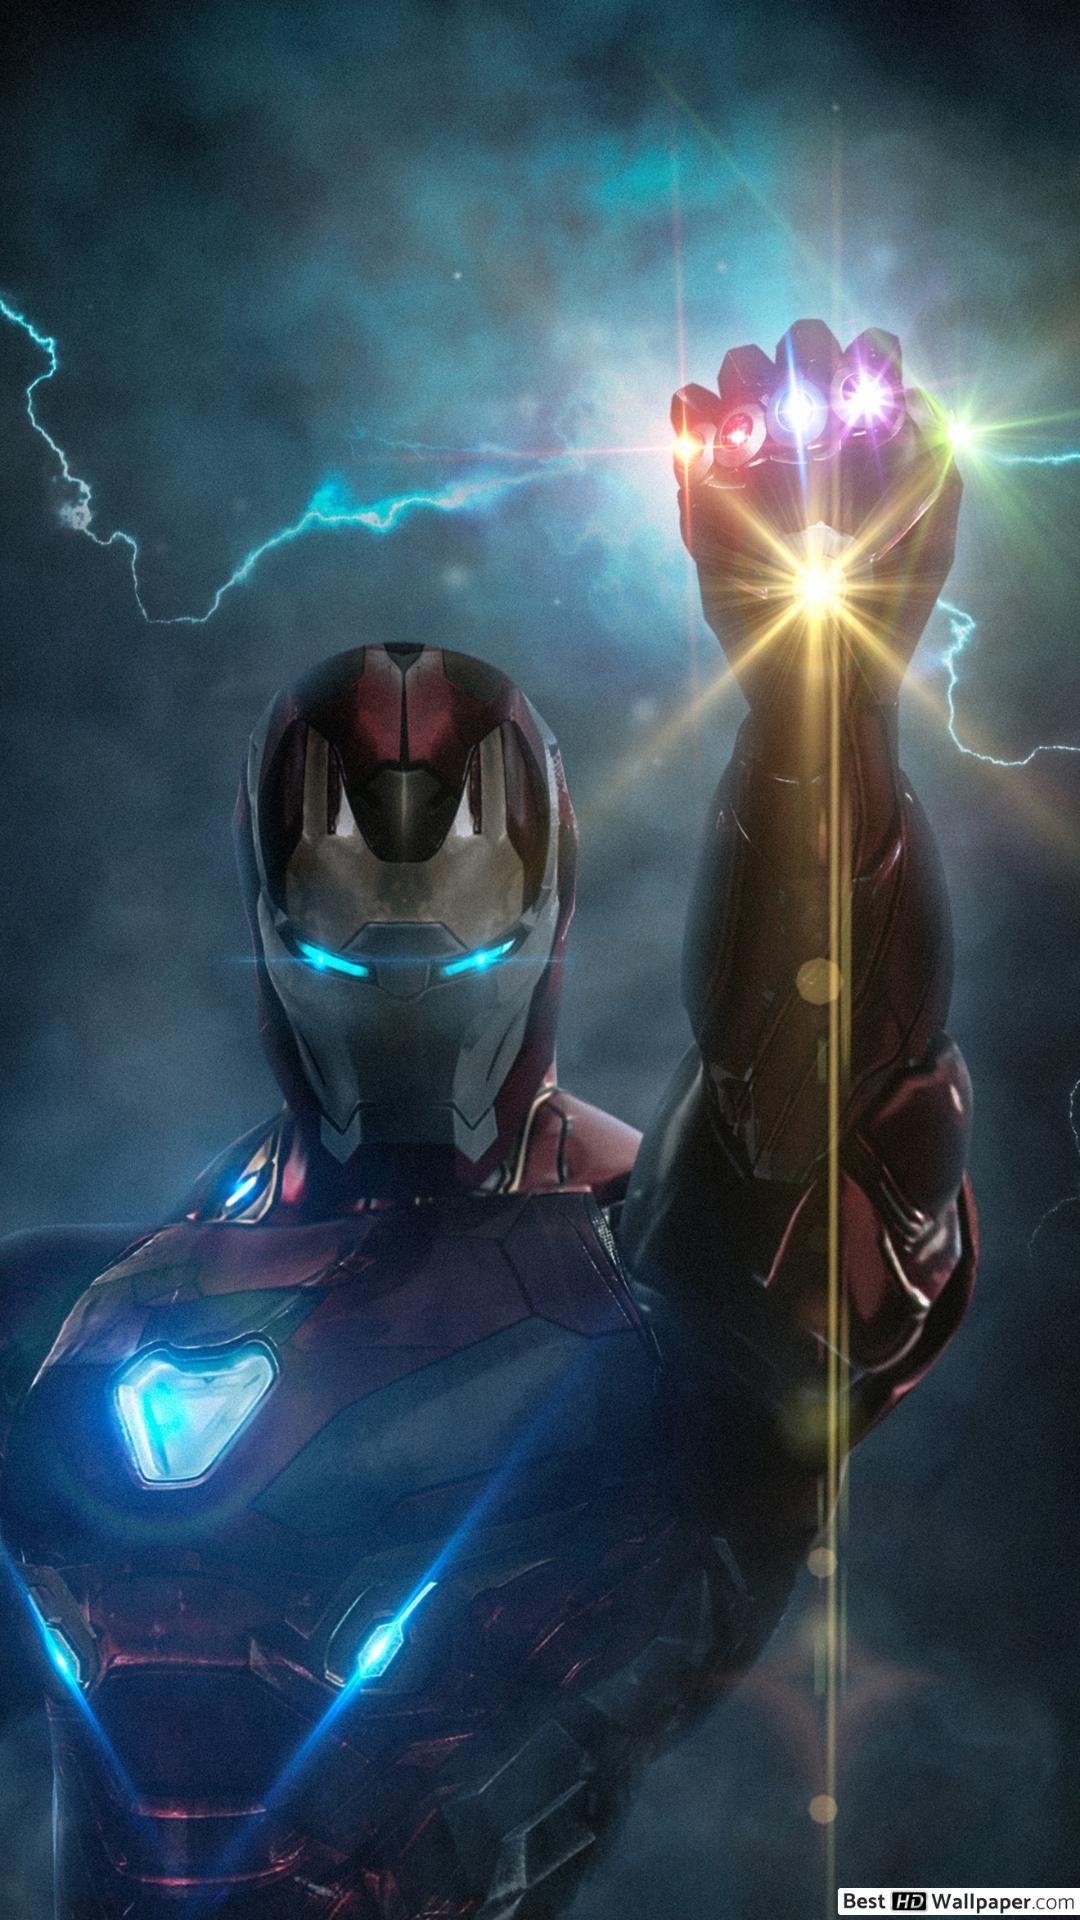 32 Wallpapers Fondos De Pantalla Marvel Para Celular En 2020 Fondo De Pantalla De Iron Man Fondo De Pantalla De Avengers Fondos De Pantalla Marvel